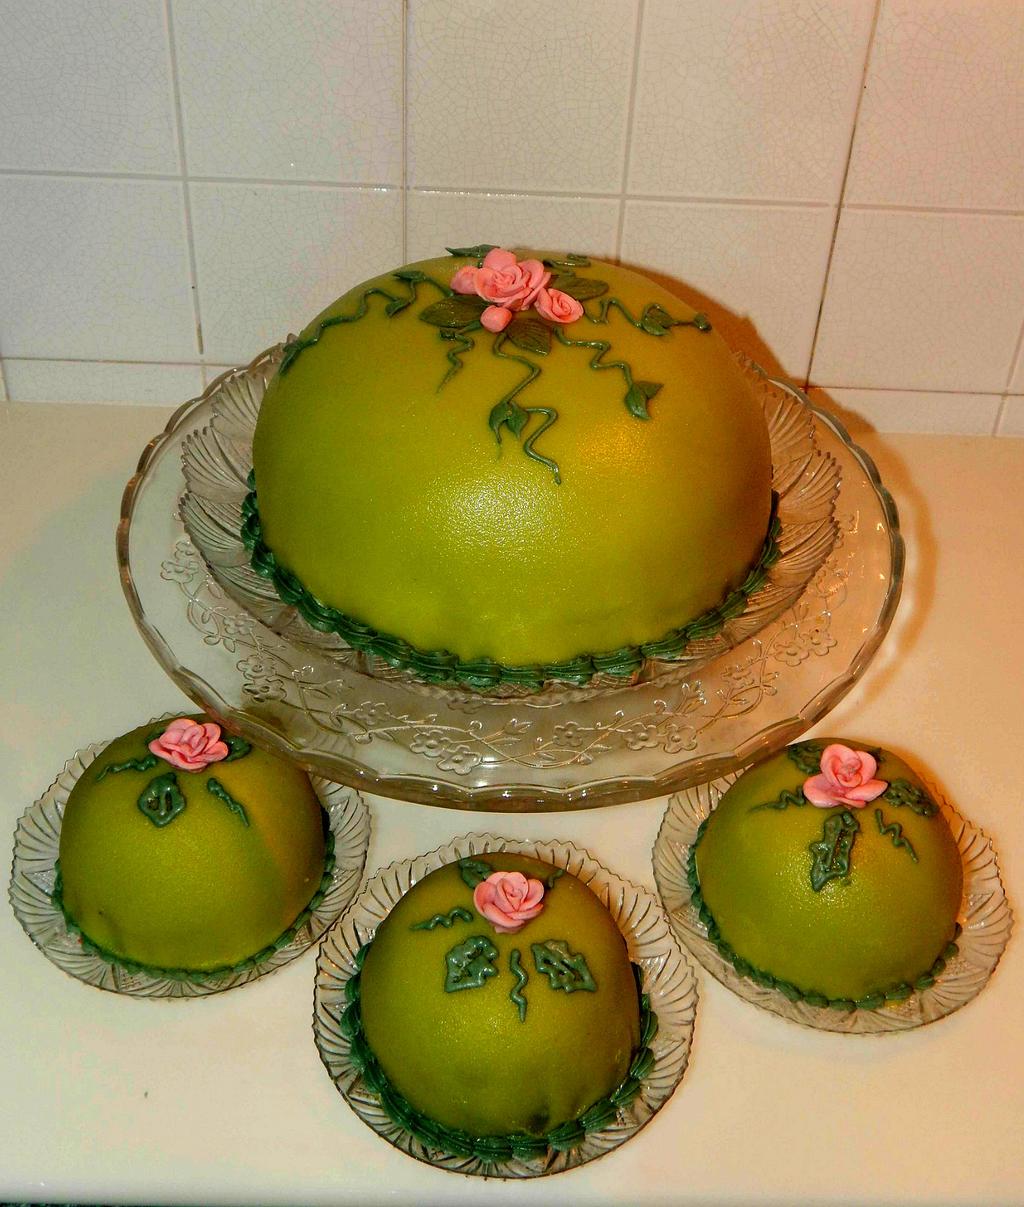 Swedish princess cakes